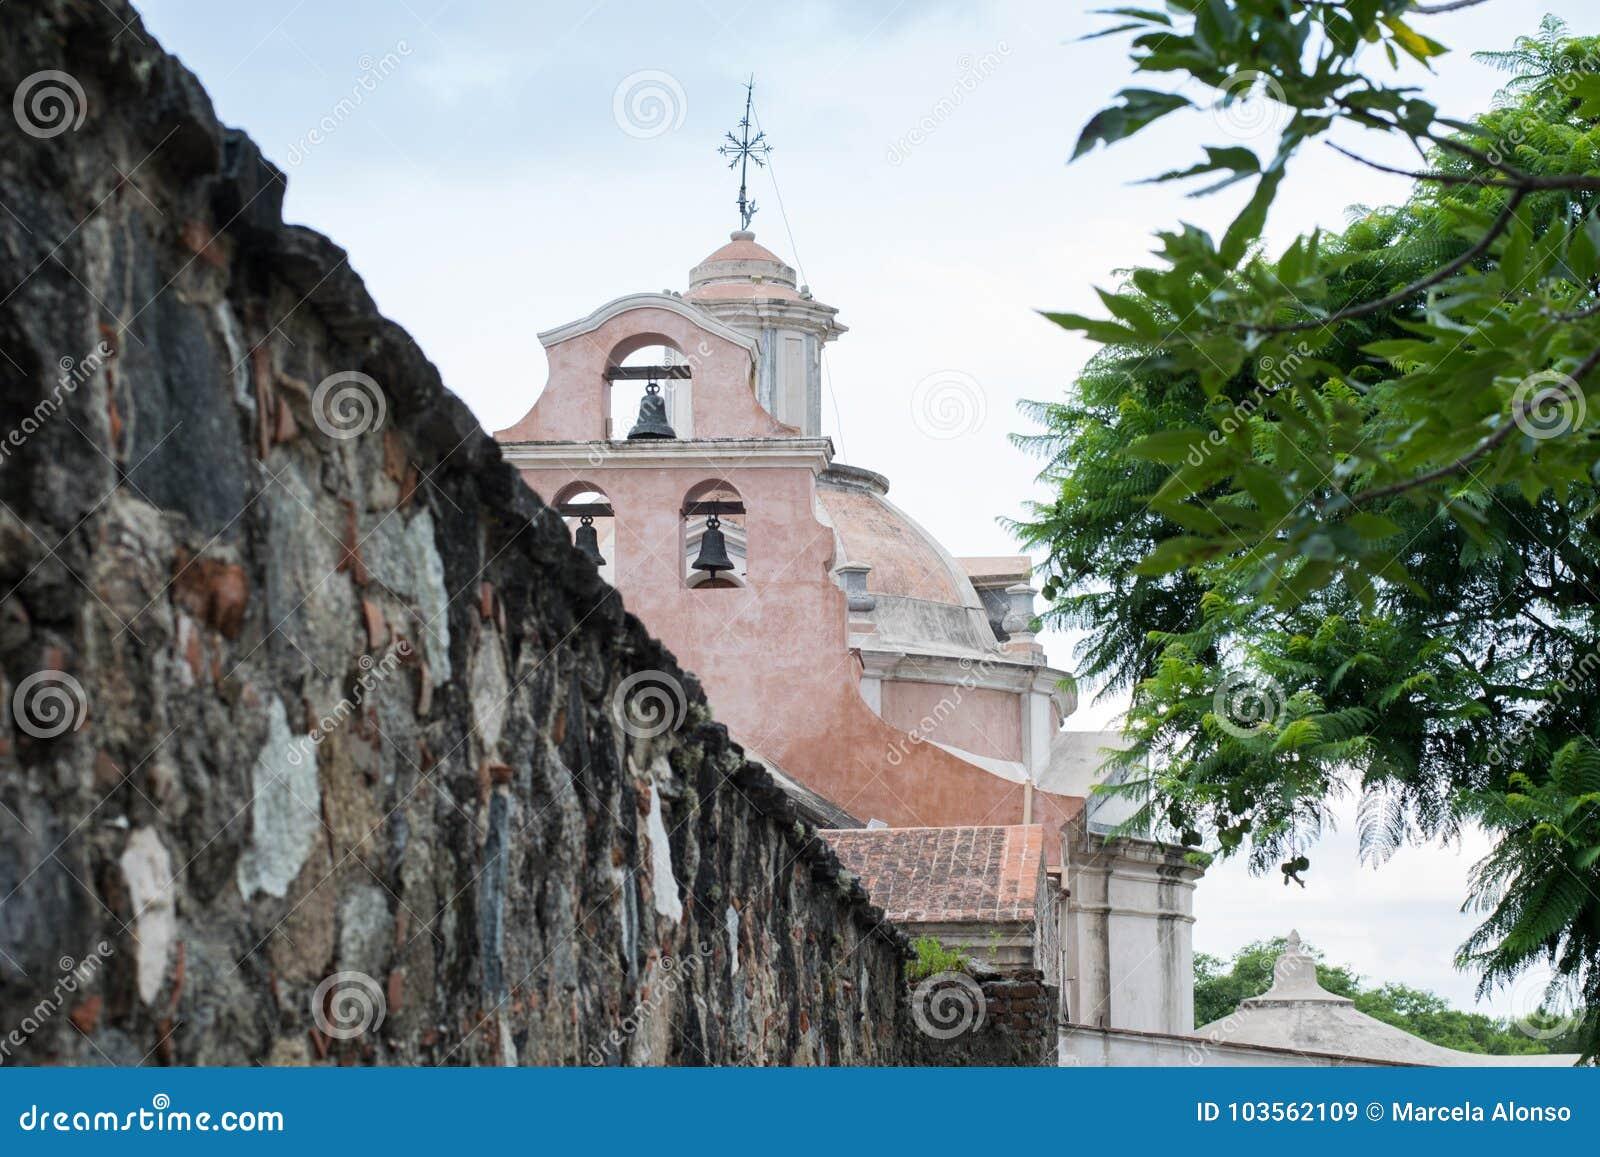 Jesuit arkitektur, världsarv, kyrka, museum Alta Gracia